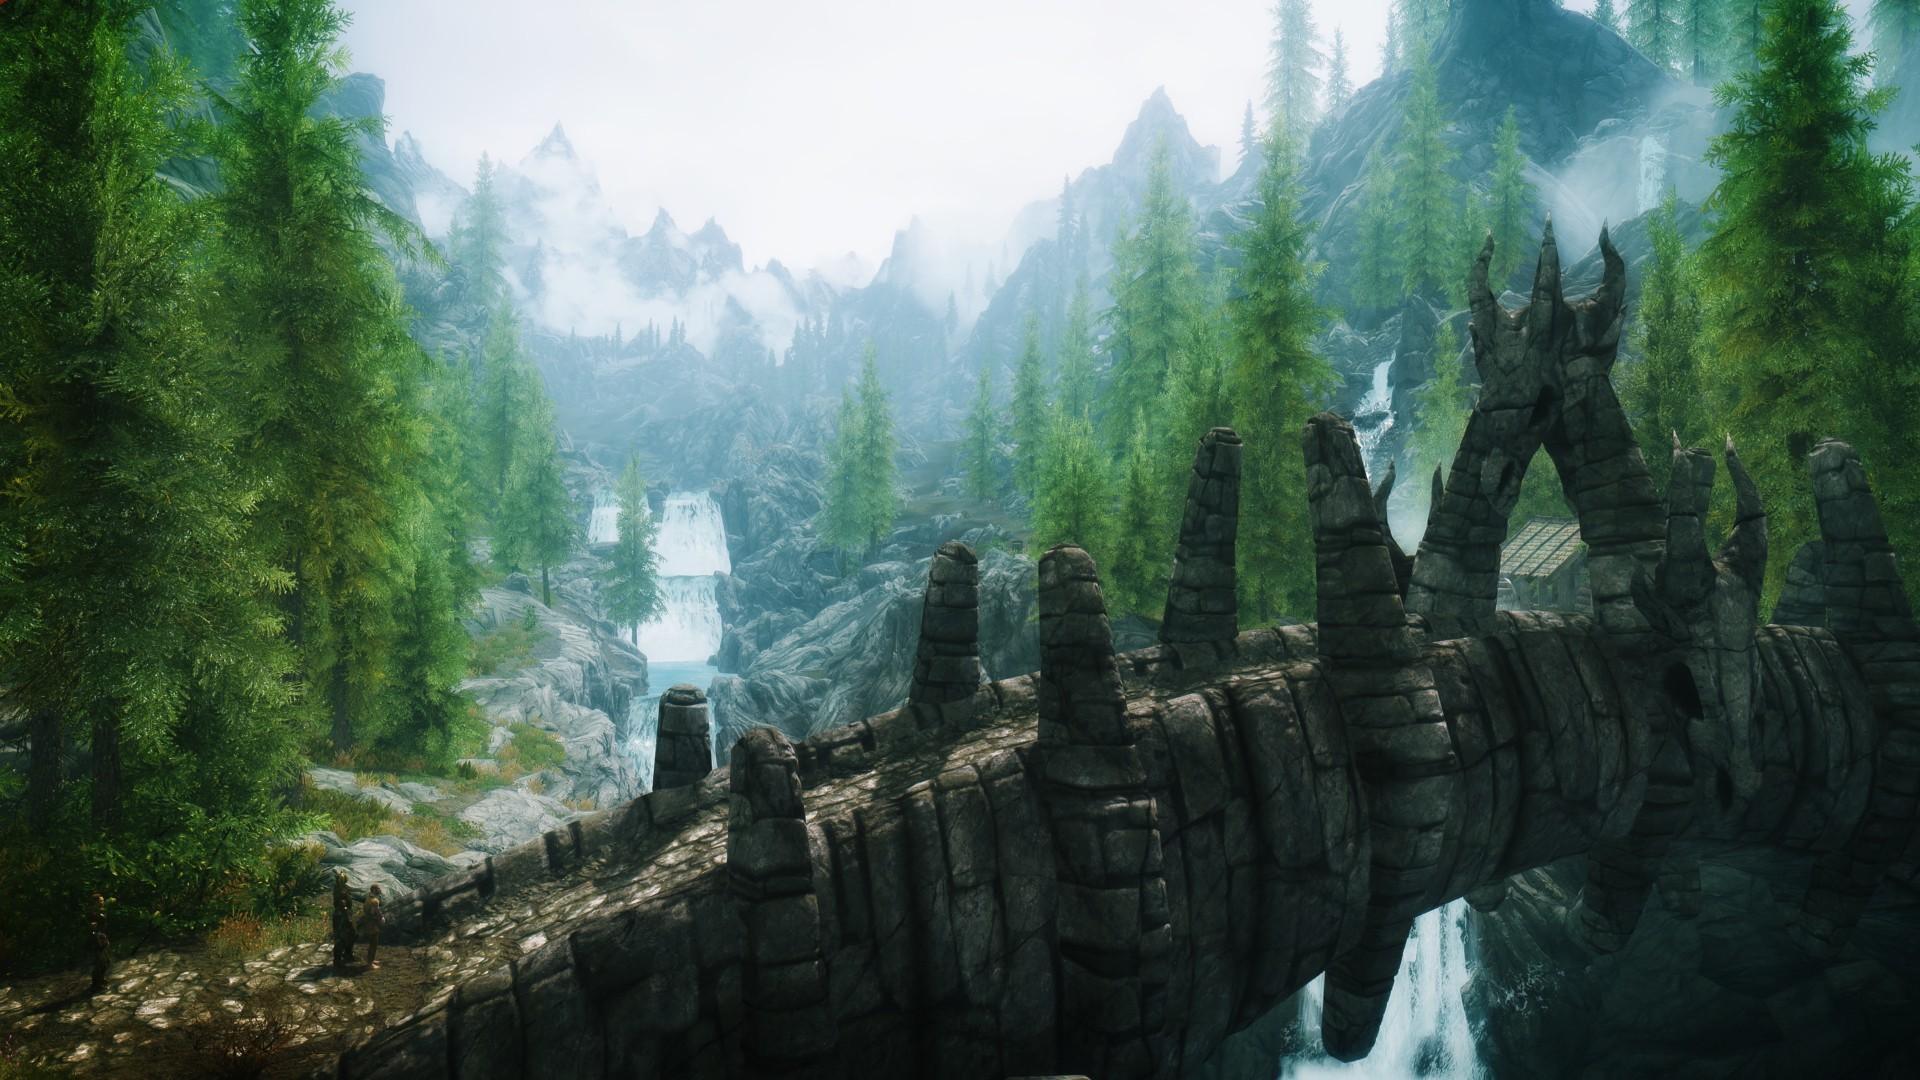 Download Elder Scrolls Skyrim HD Wallpaper